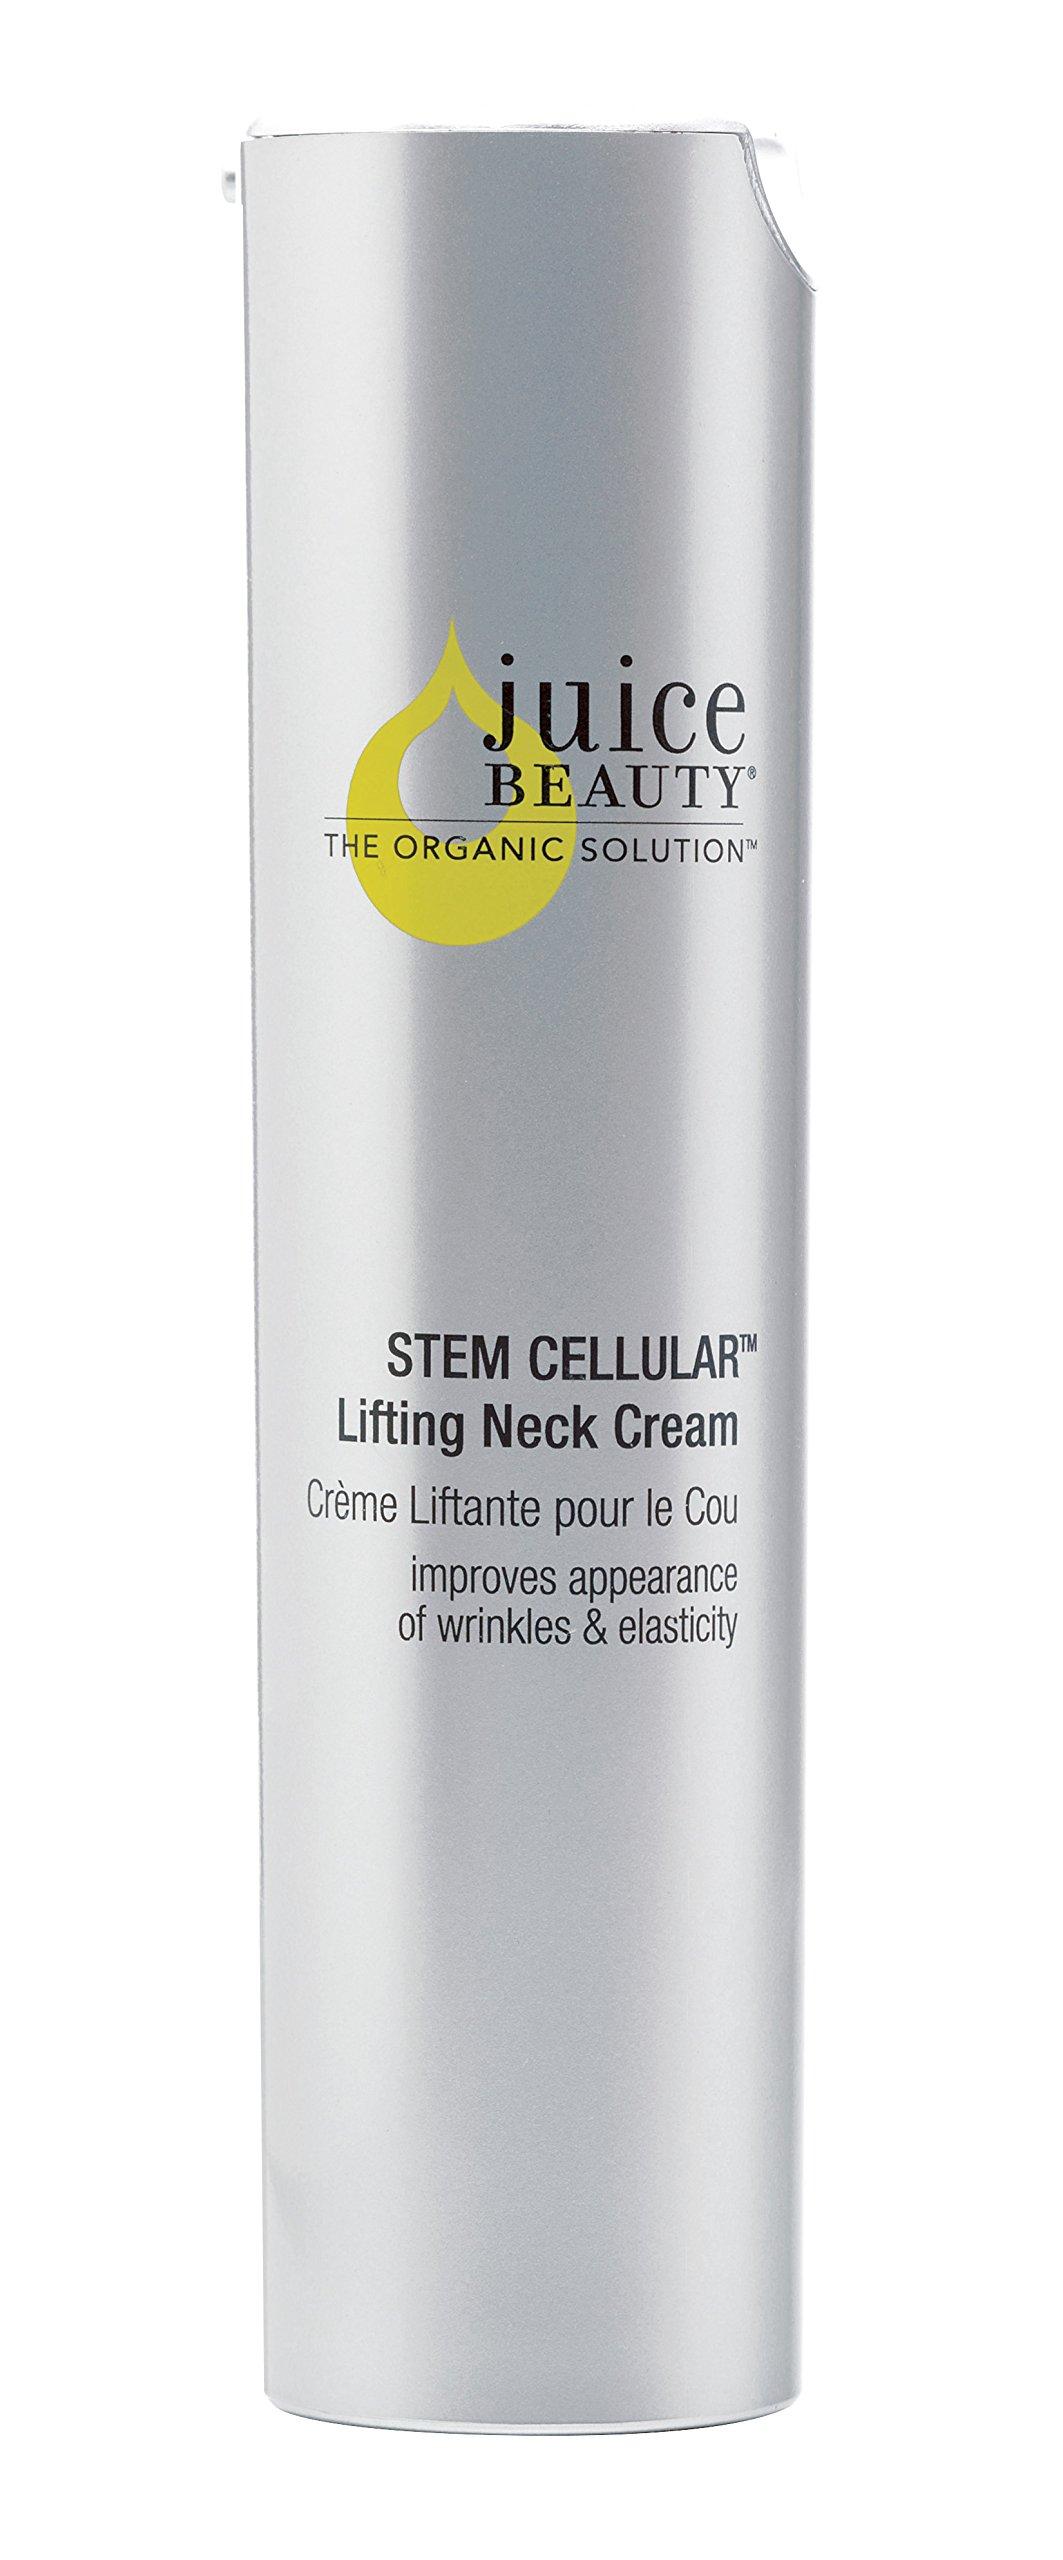 Juice Beauty Stem Cellular Neck Lifting Cream - 1.7 oz